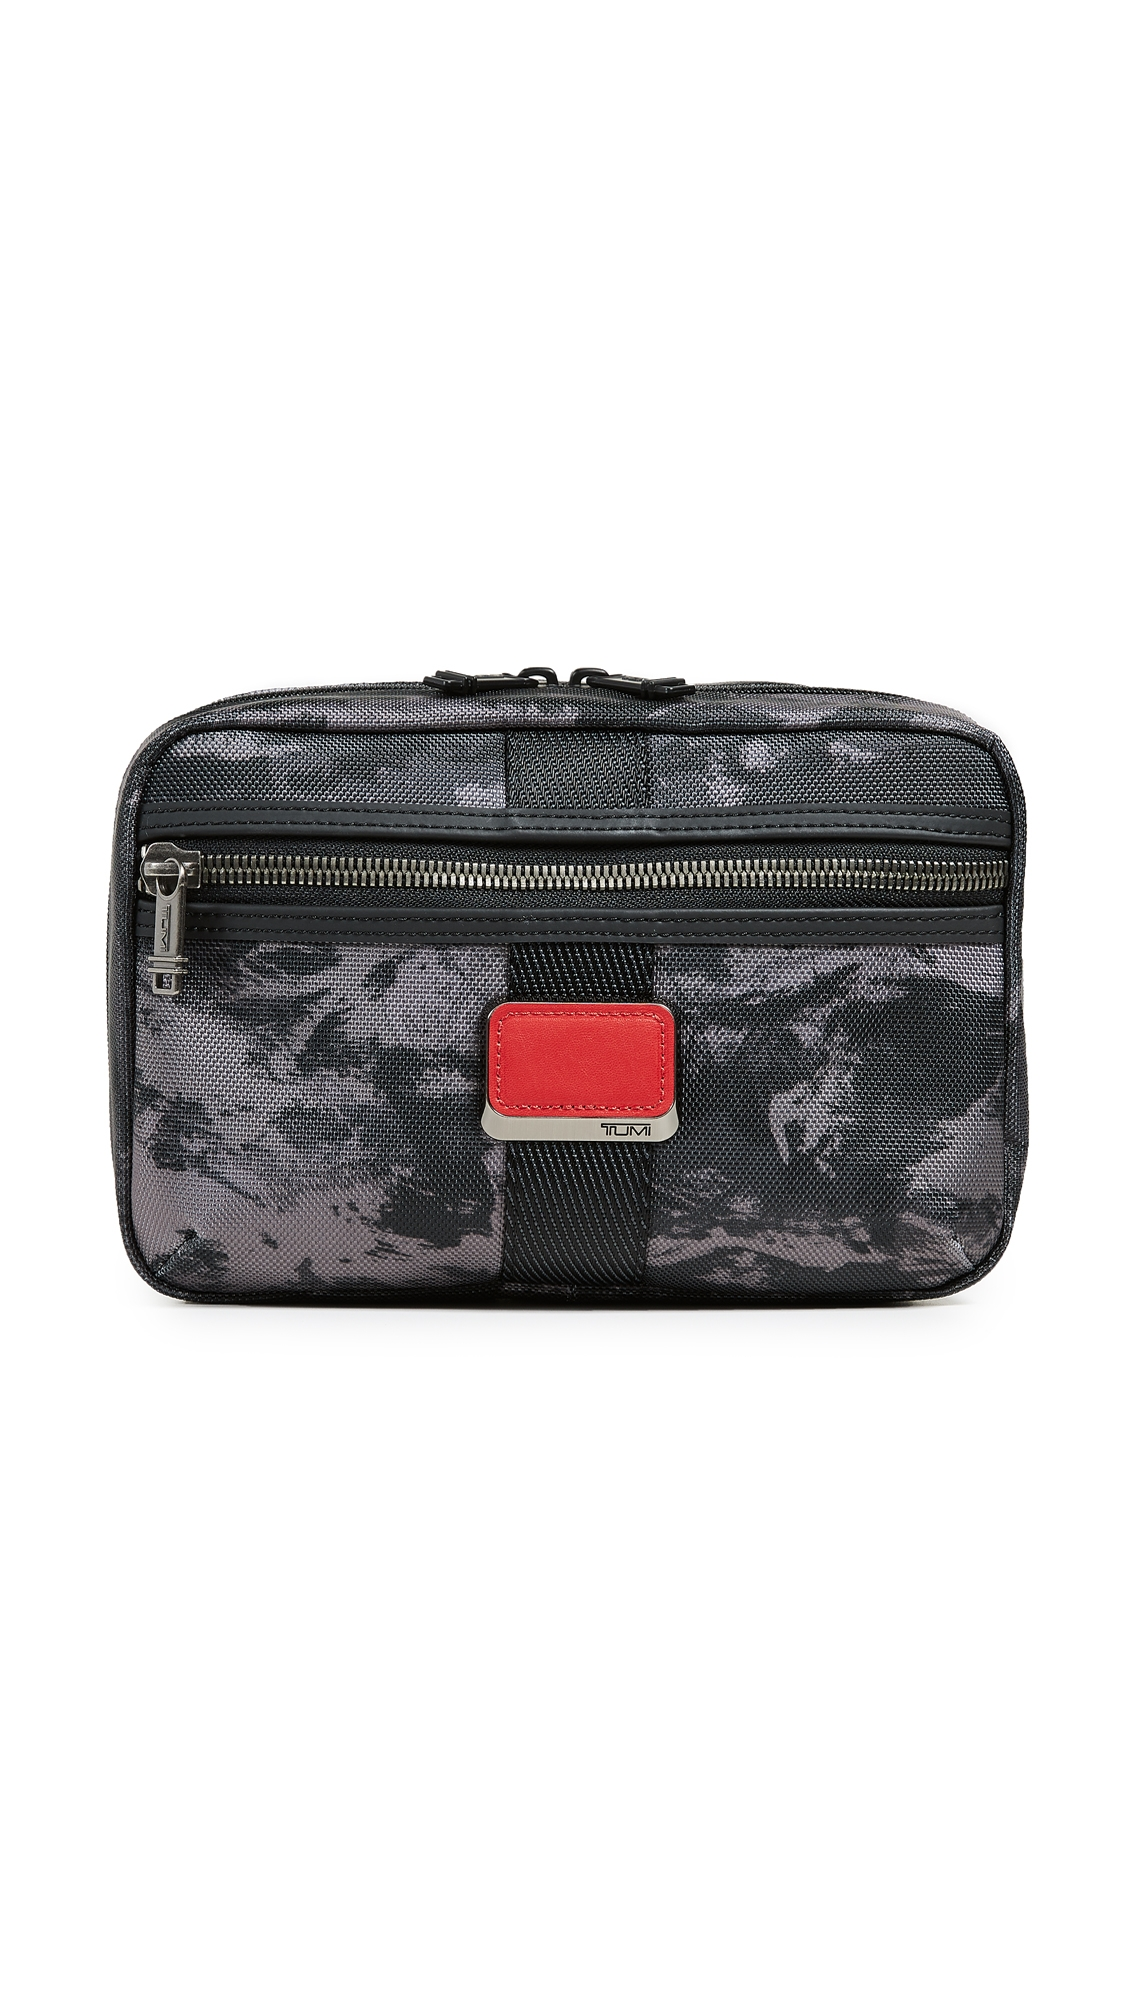 Alpha Bravo Reno Travel Kit Travel kits, Tumi, Travel